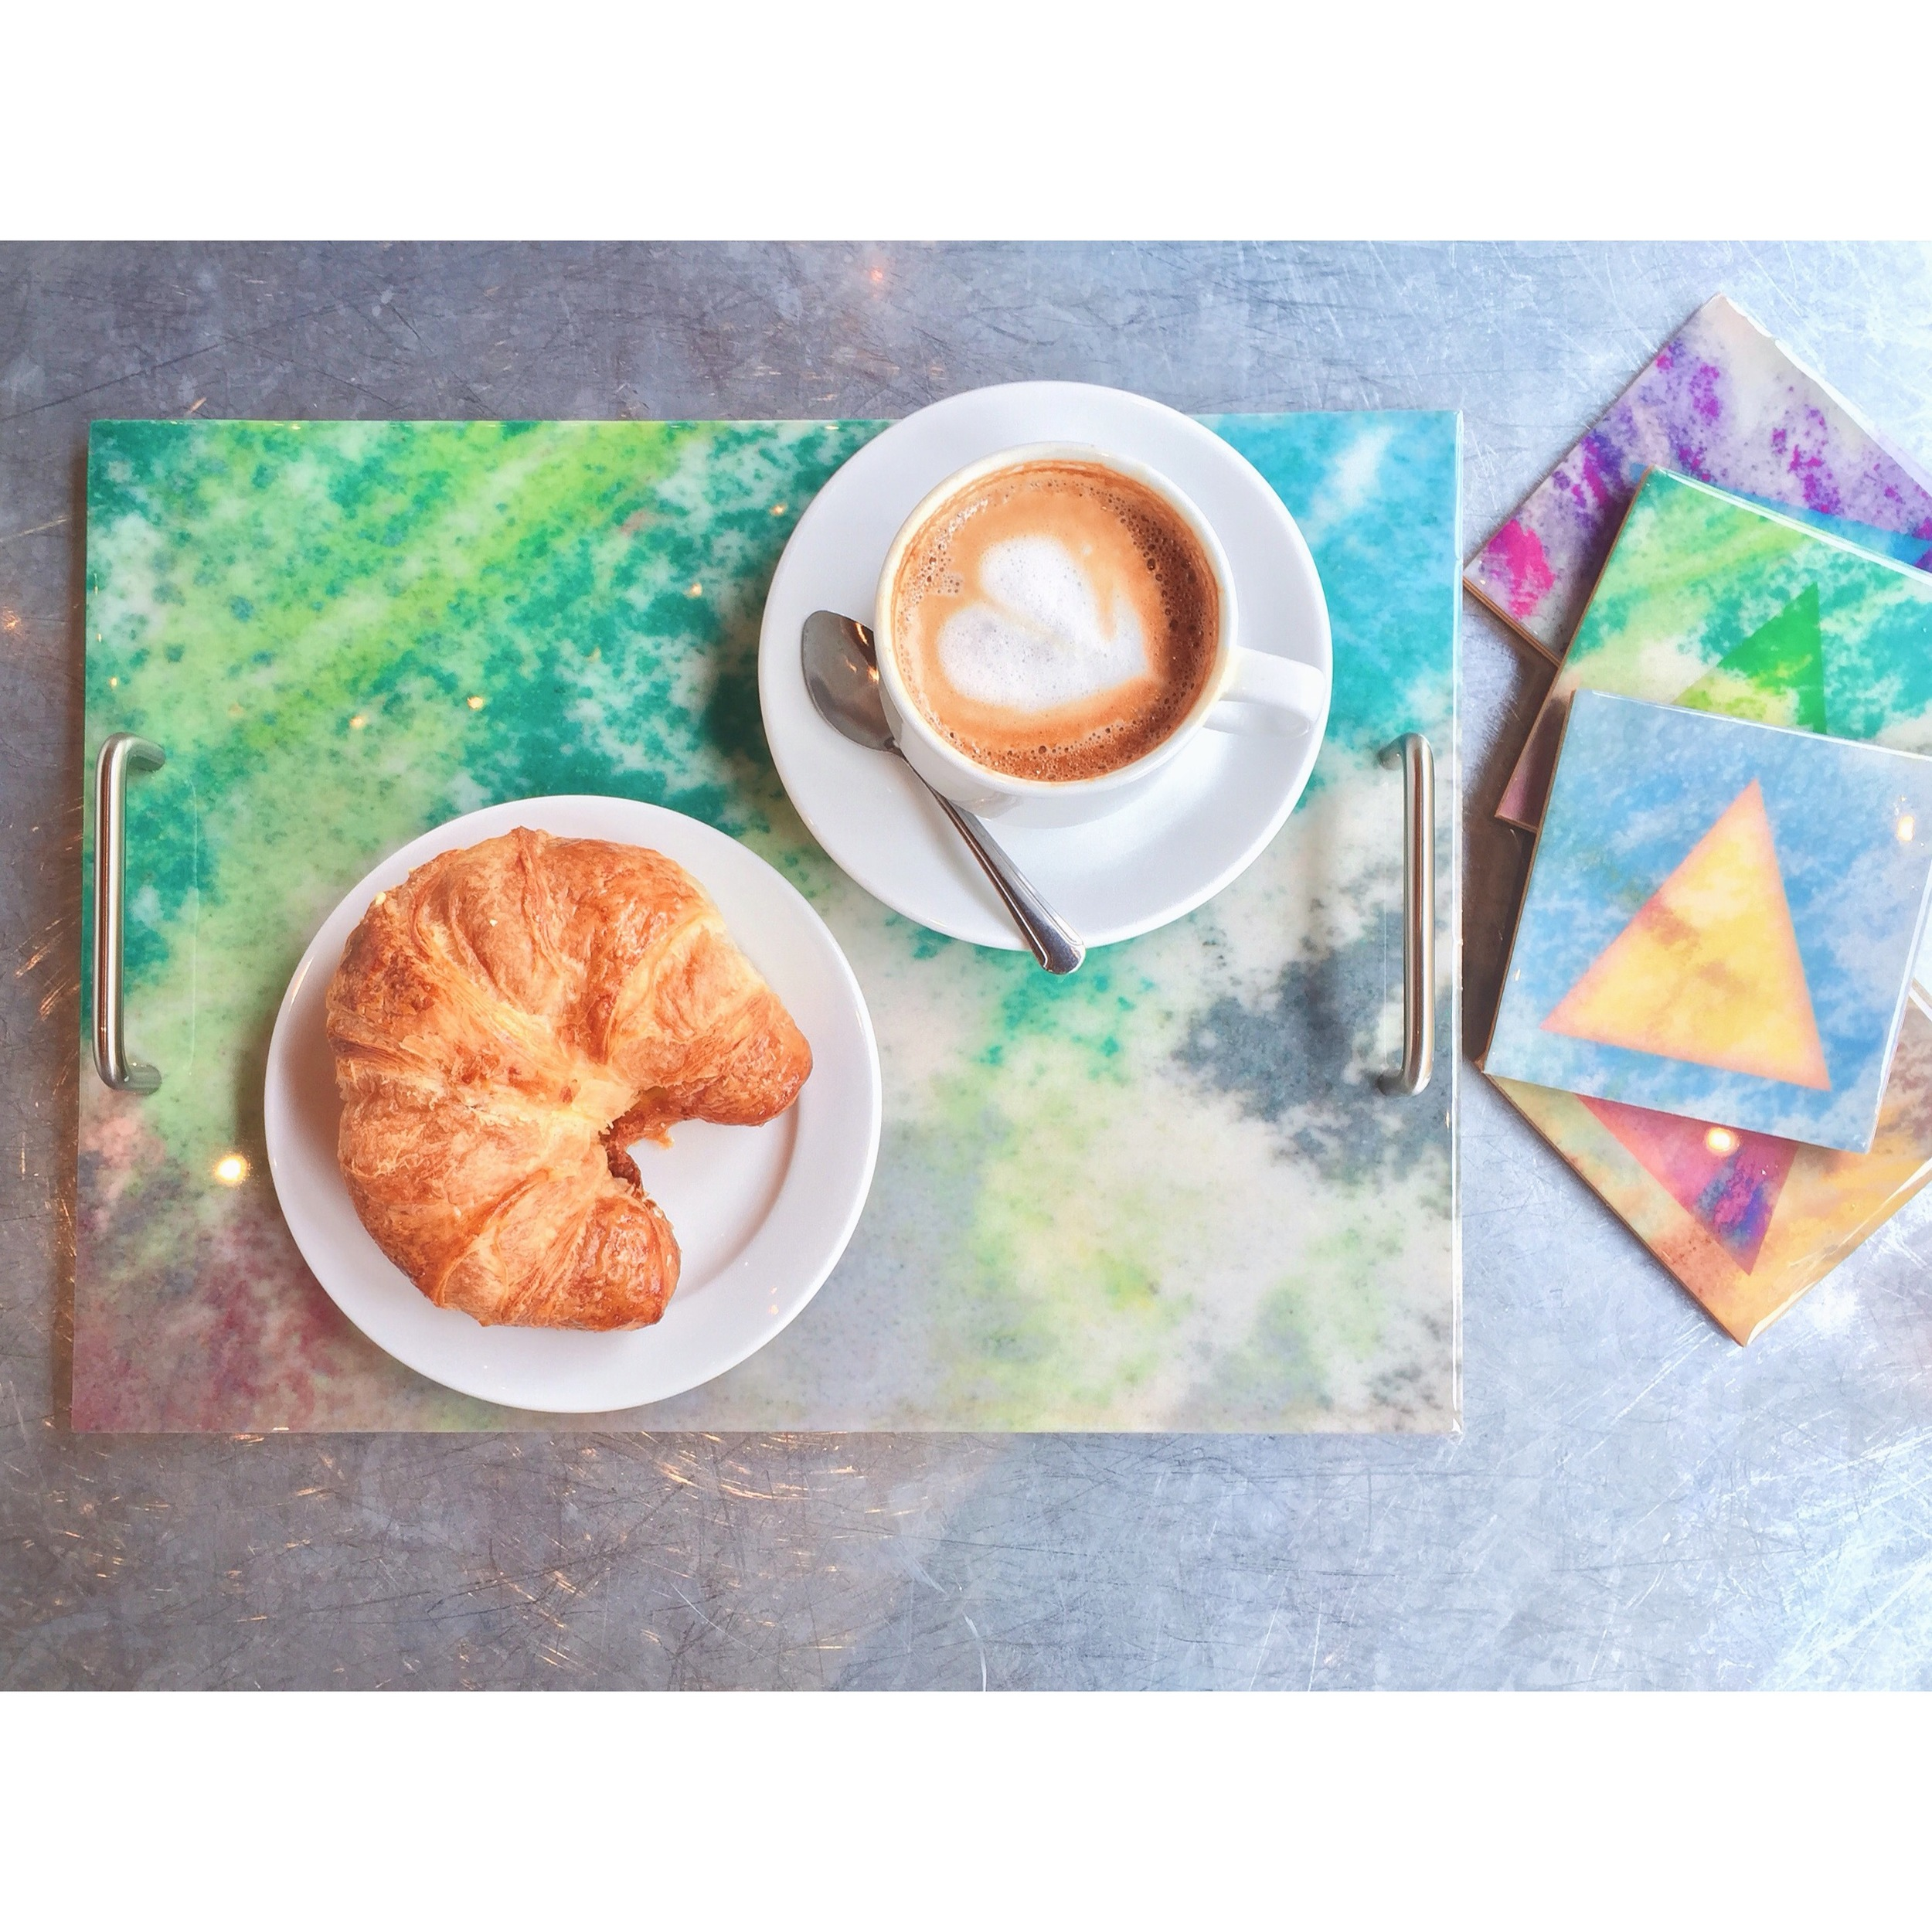 Post Studio Green Pastel Tray and Coasters.JPG